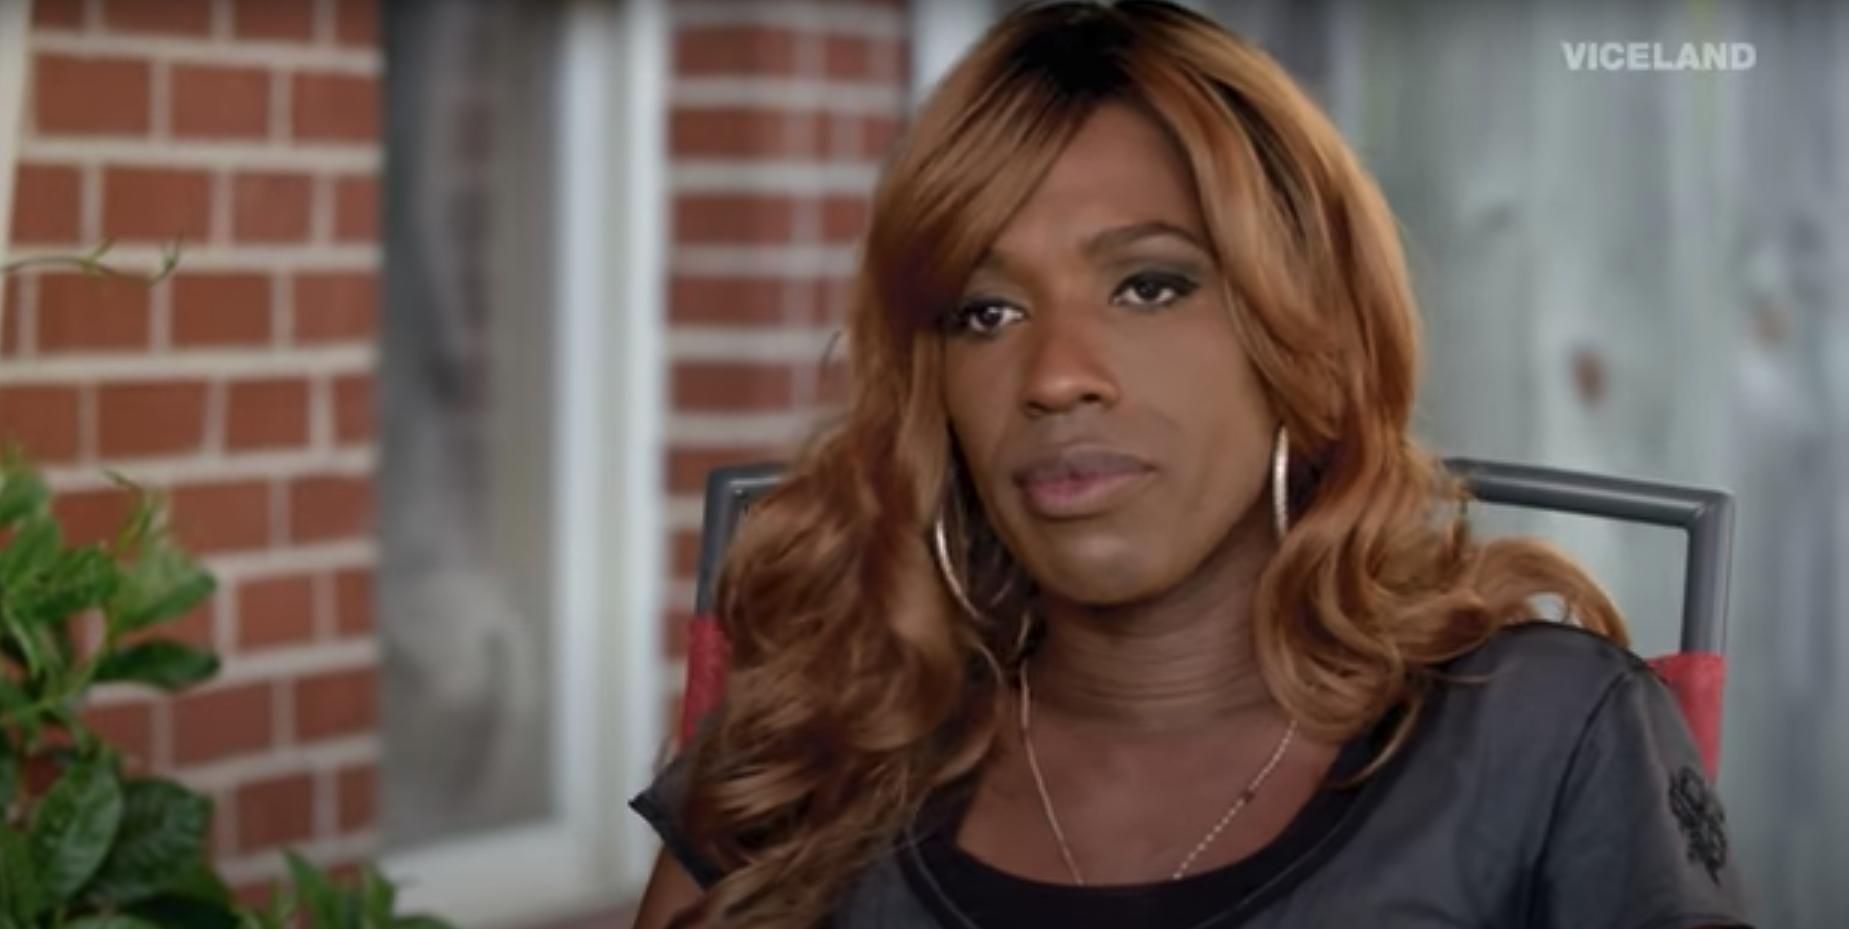 , A Black Trans Woman In a Men's Prison Is Suing (Again) Over Horrific Abuse, Saubio Making Wealth